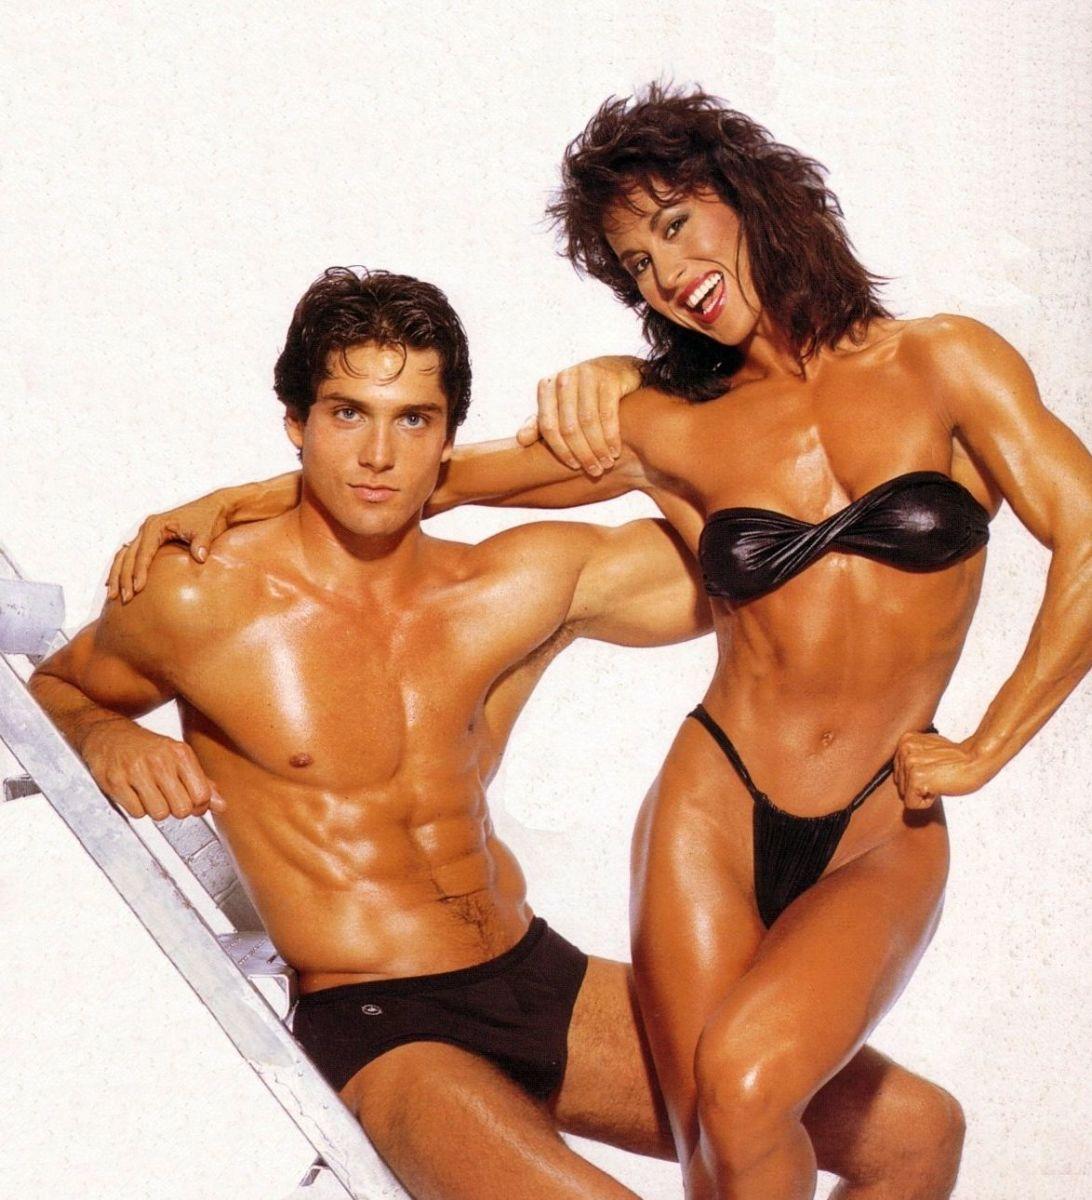 Rachel McLish in a 1980s fitness magazine